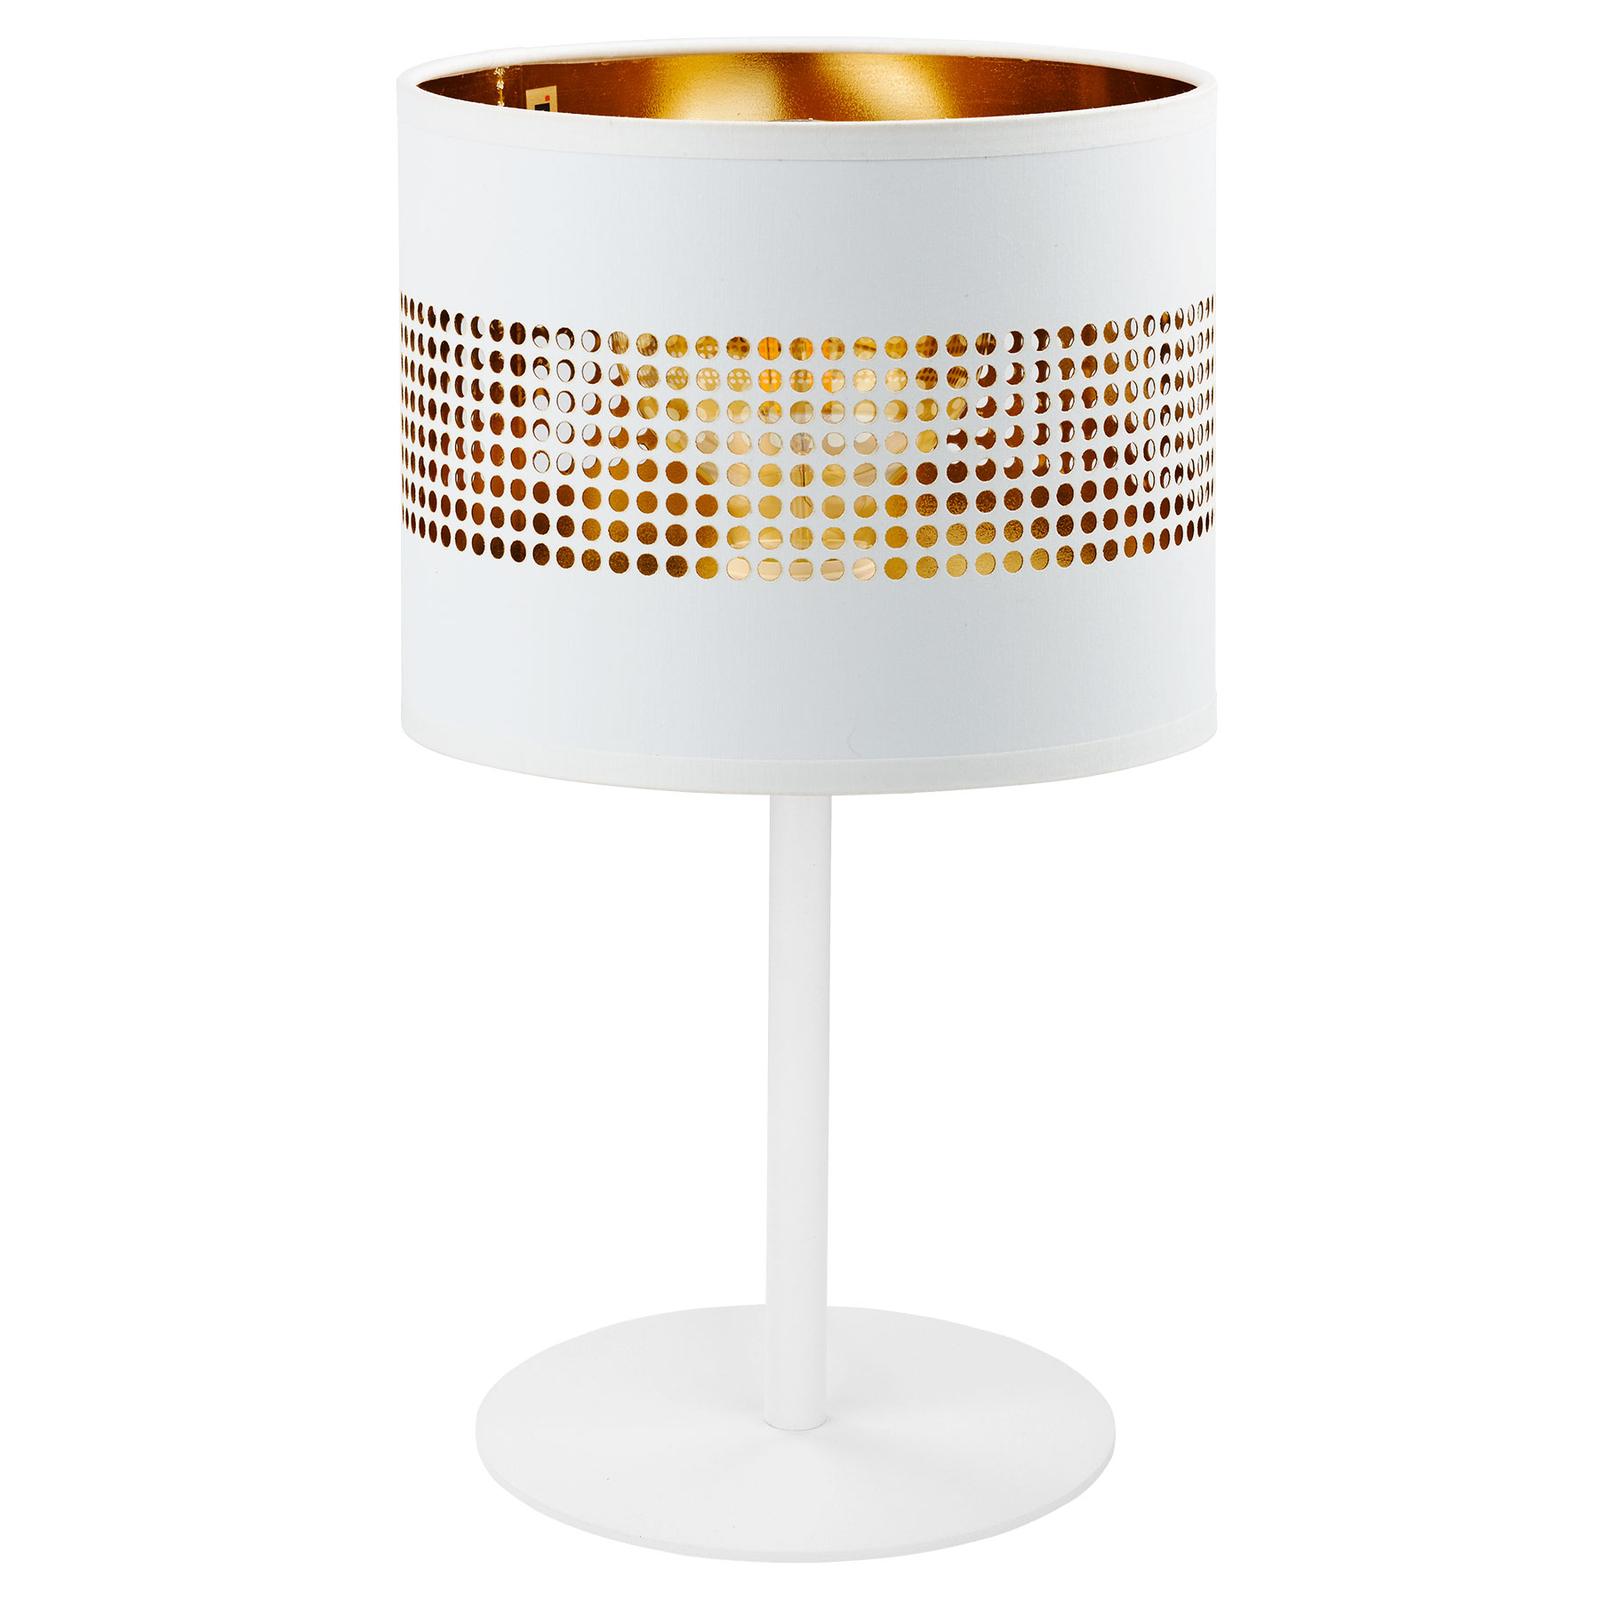 Tafellamp Tago wit/goud